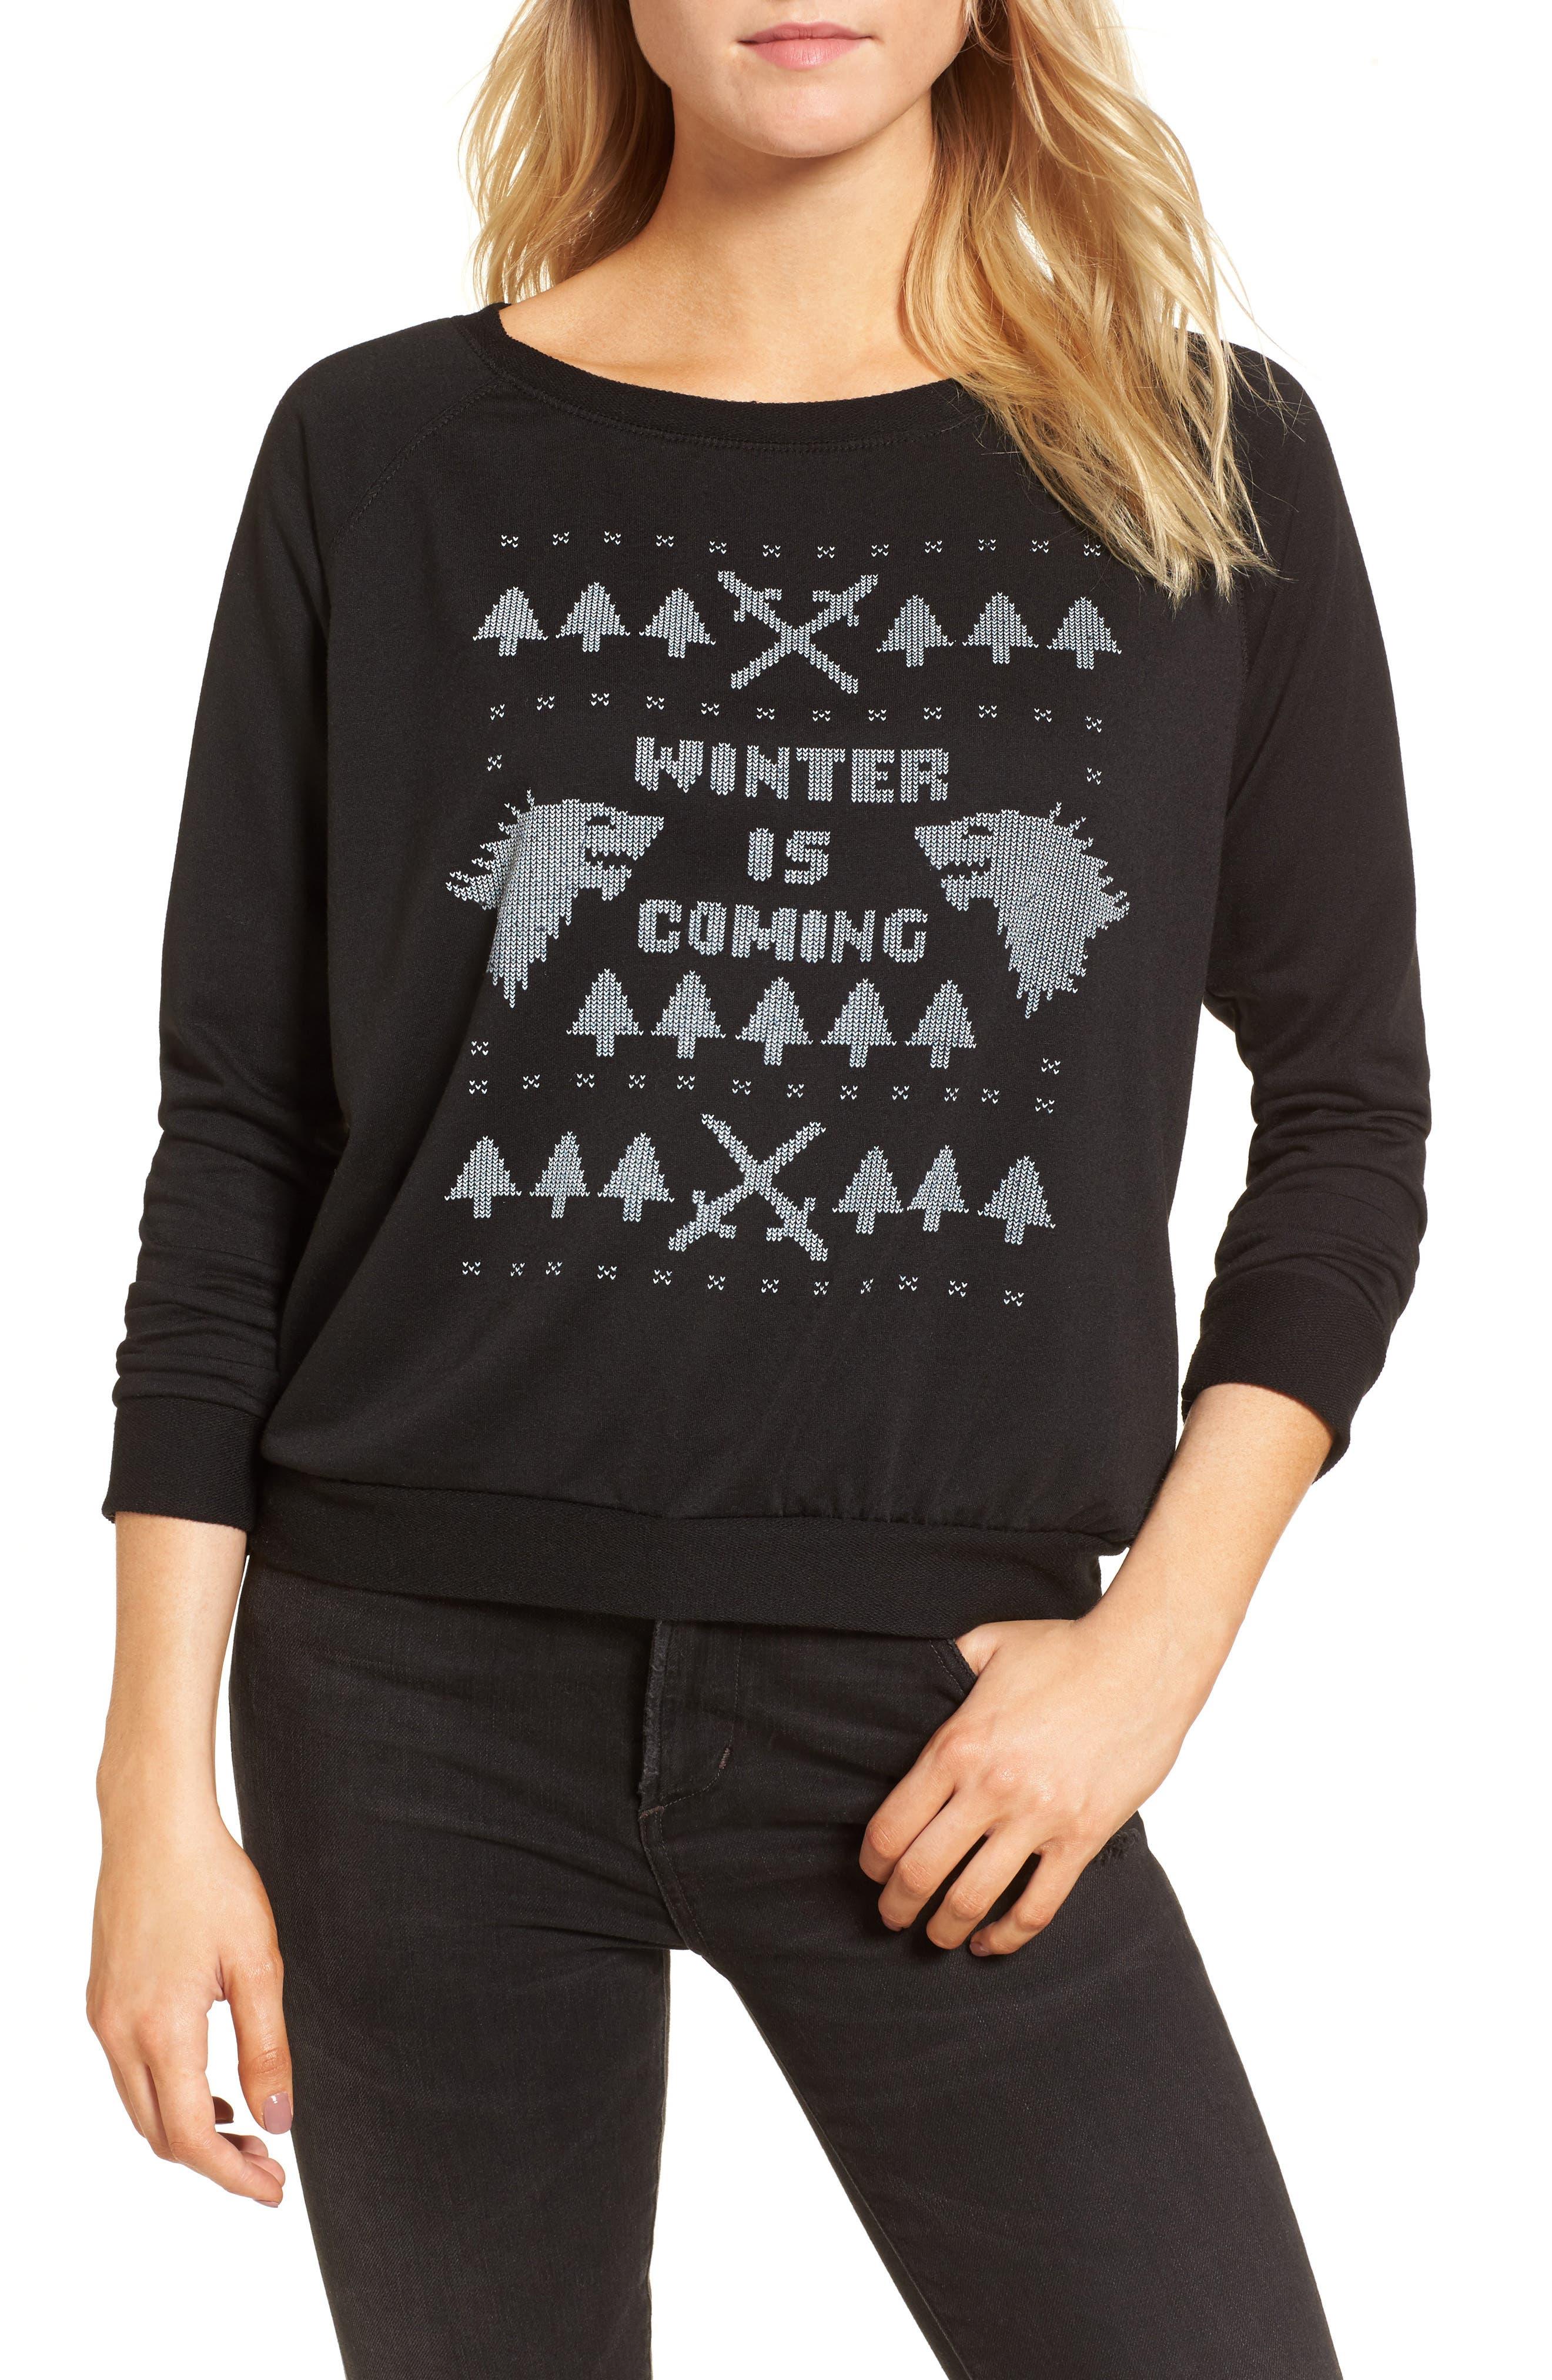 Winter Is Coming Sweatshirt,                         Main,                         color, Black